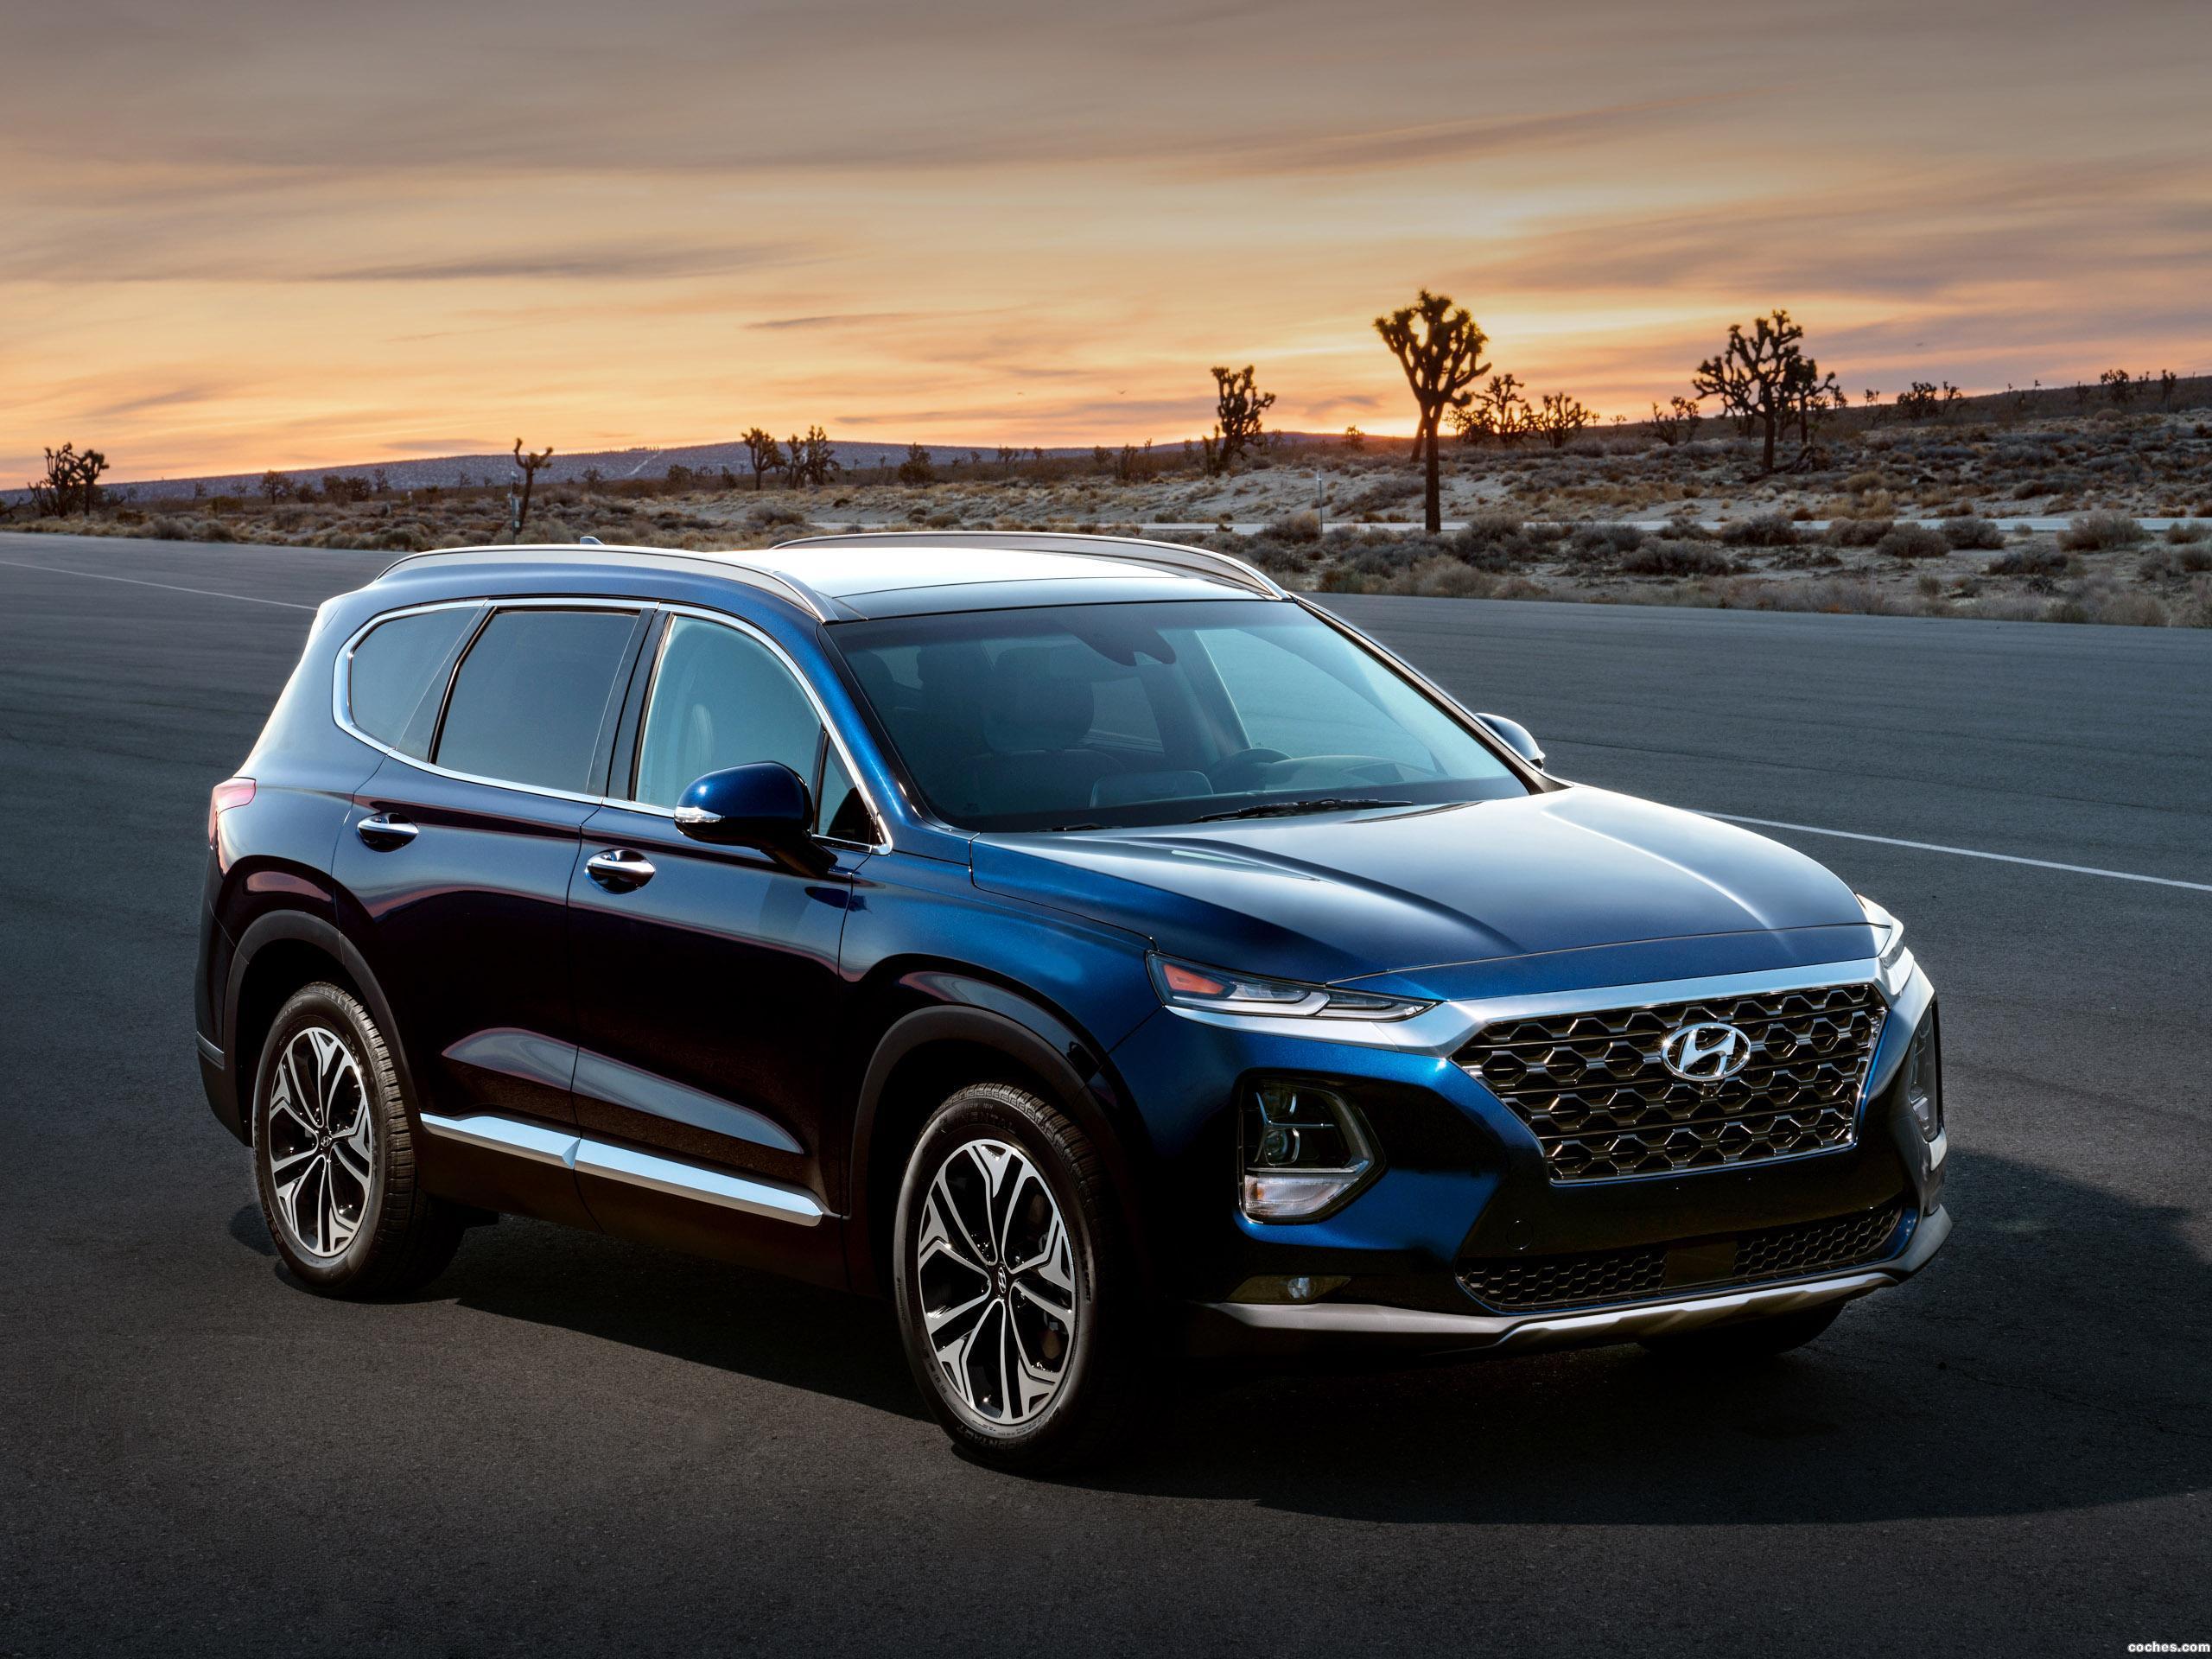 Foto 1 de Hyundai Santa Fe USA 2018